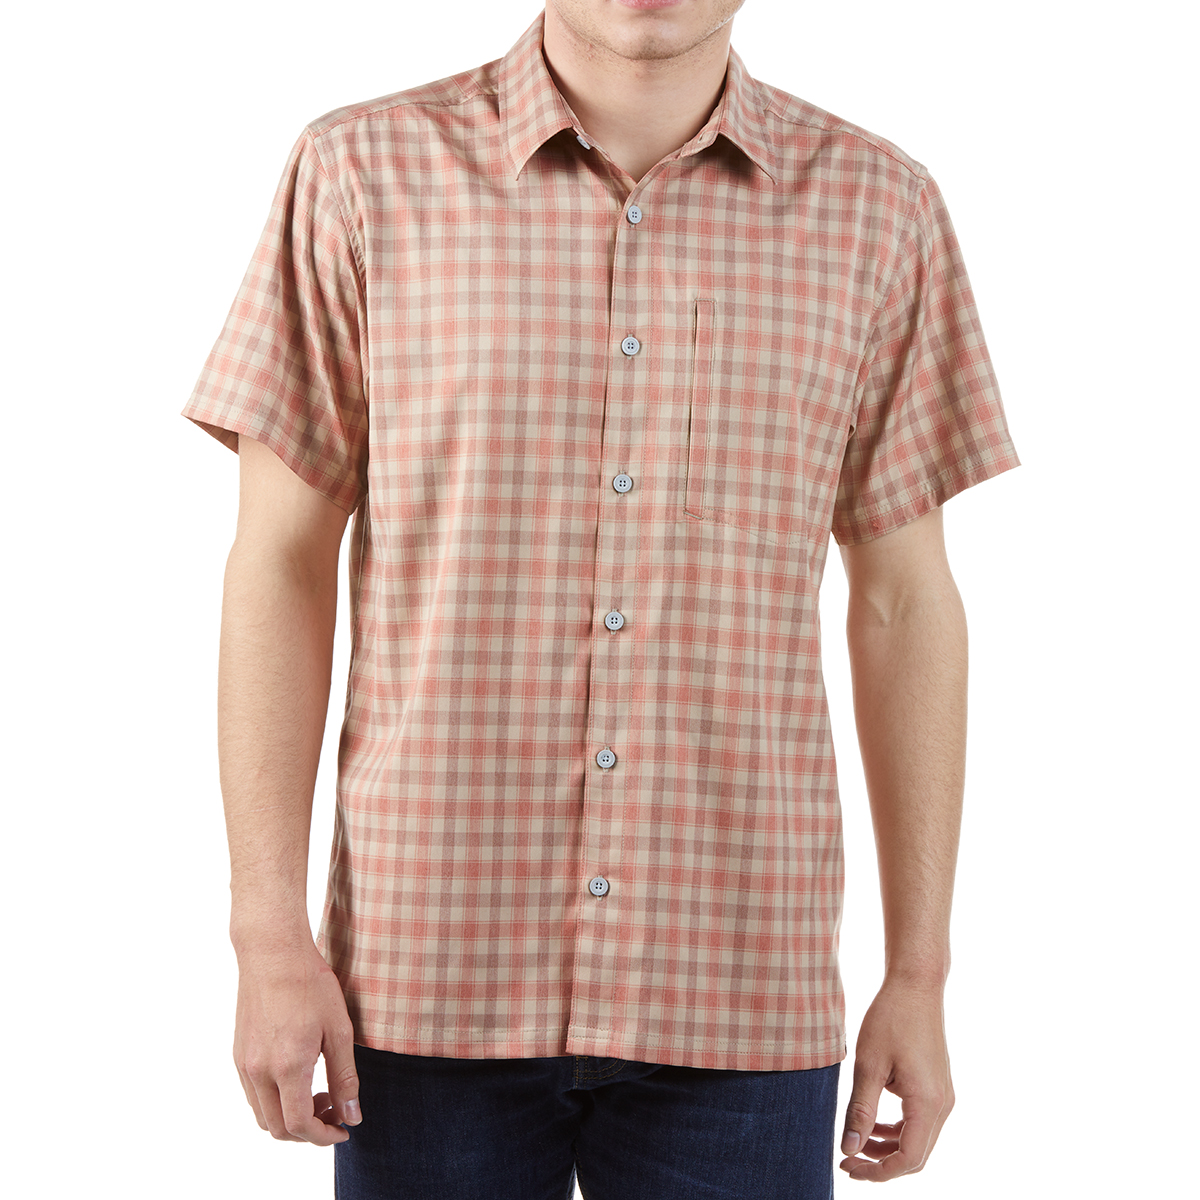 Ems Men's Journey Woven Short-Sleeve Shirt - Brown, S